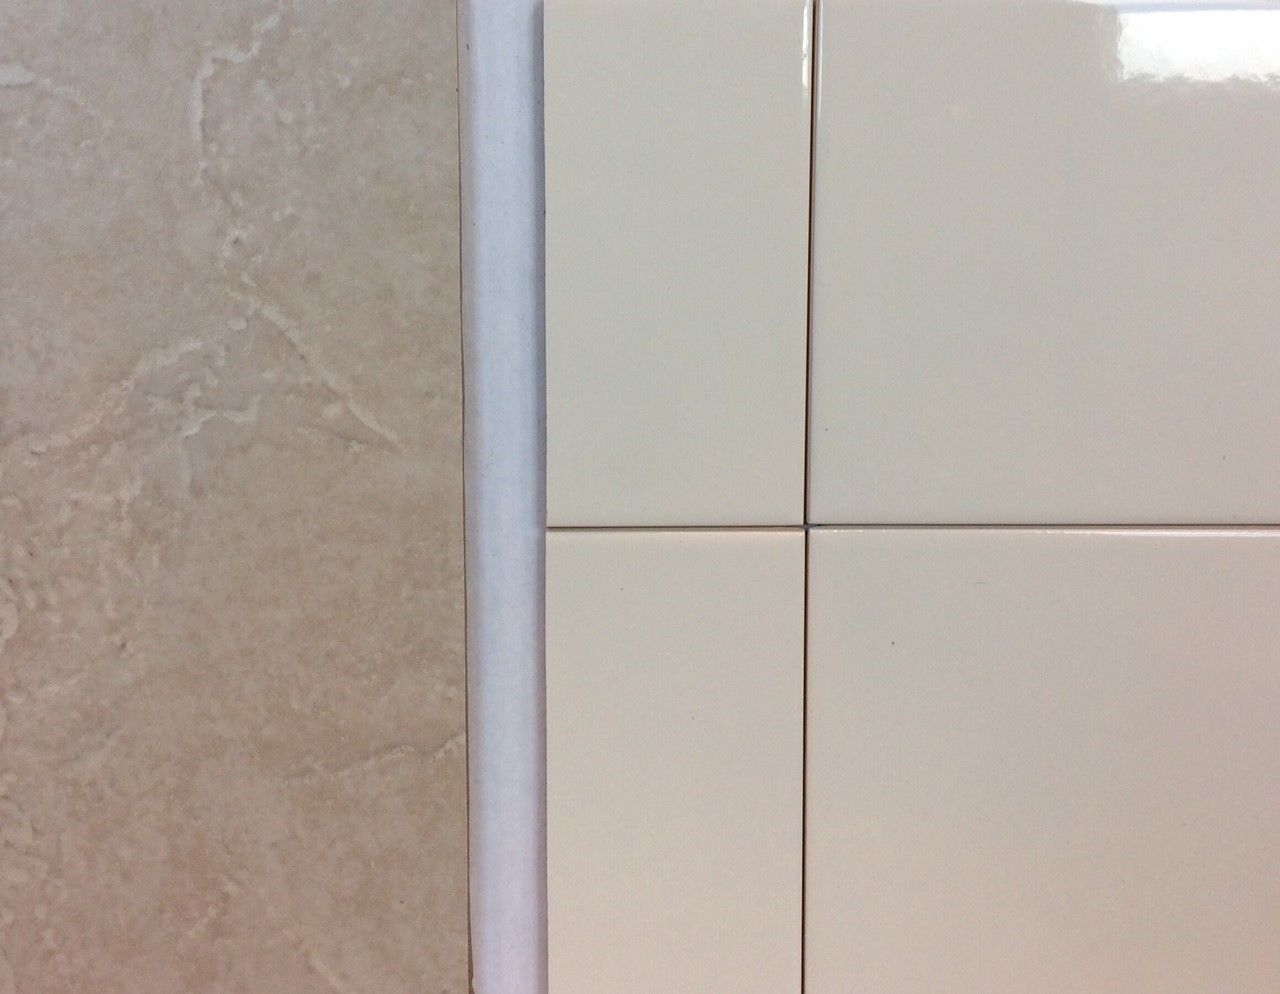 Level 2 Bath Tile